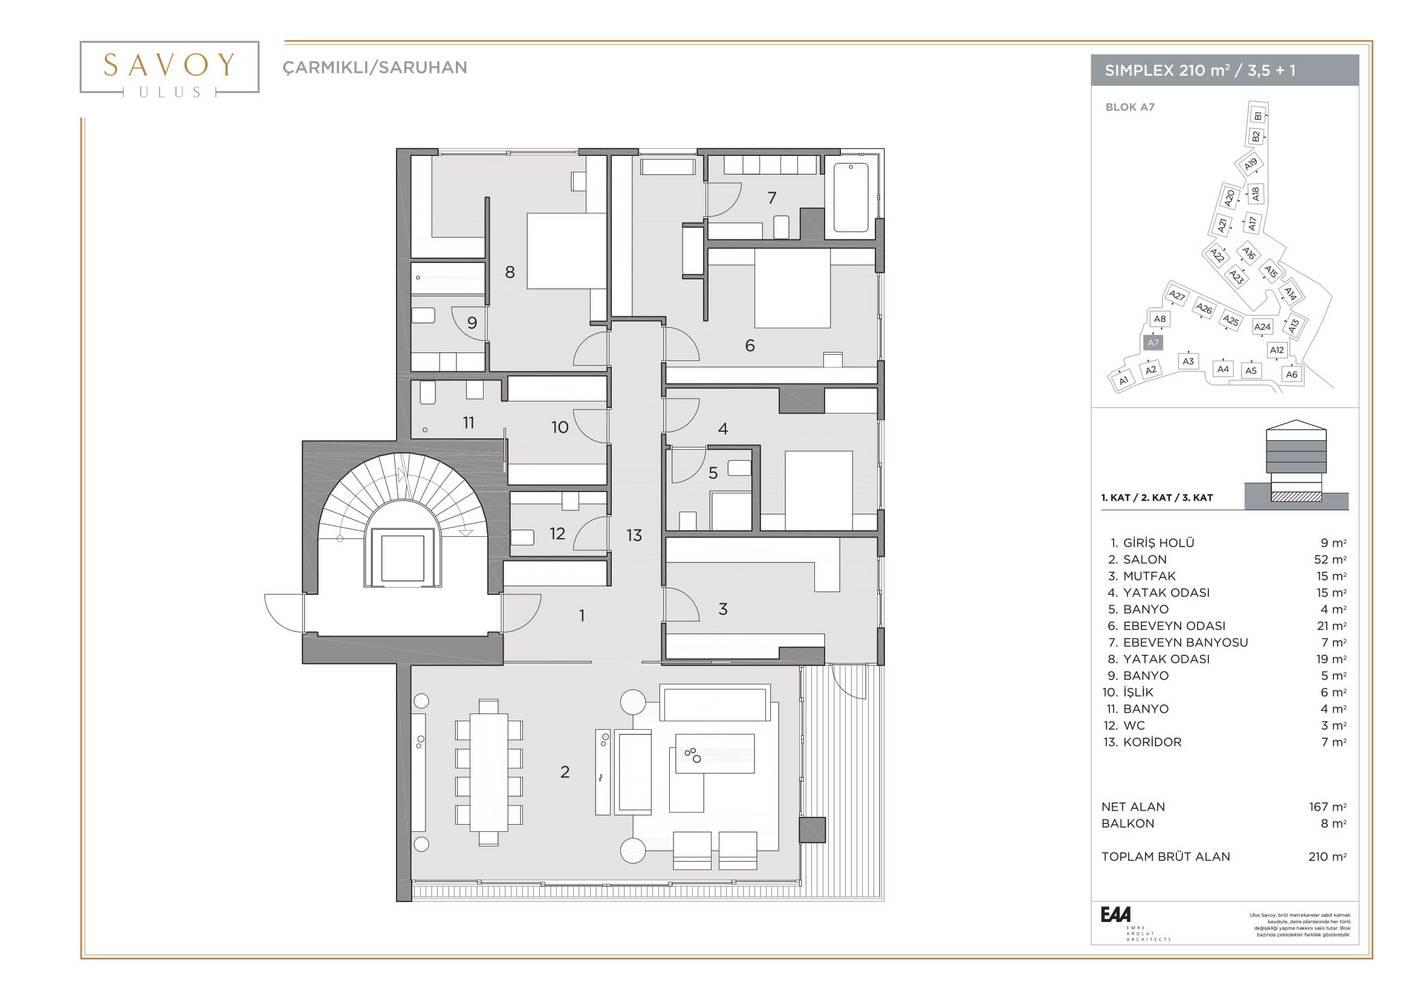 Savoy Residence S210